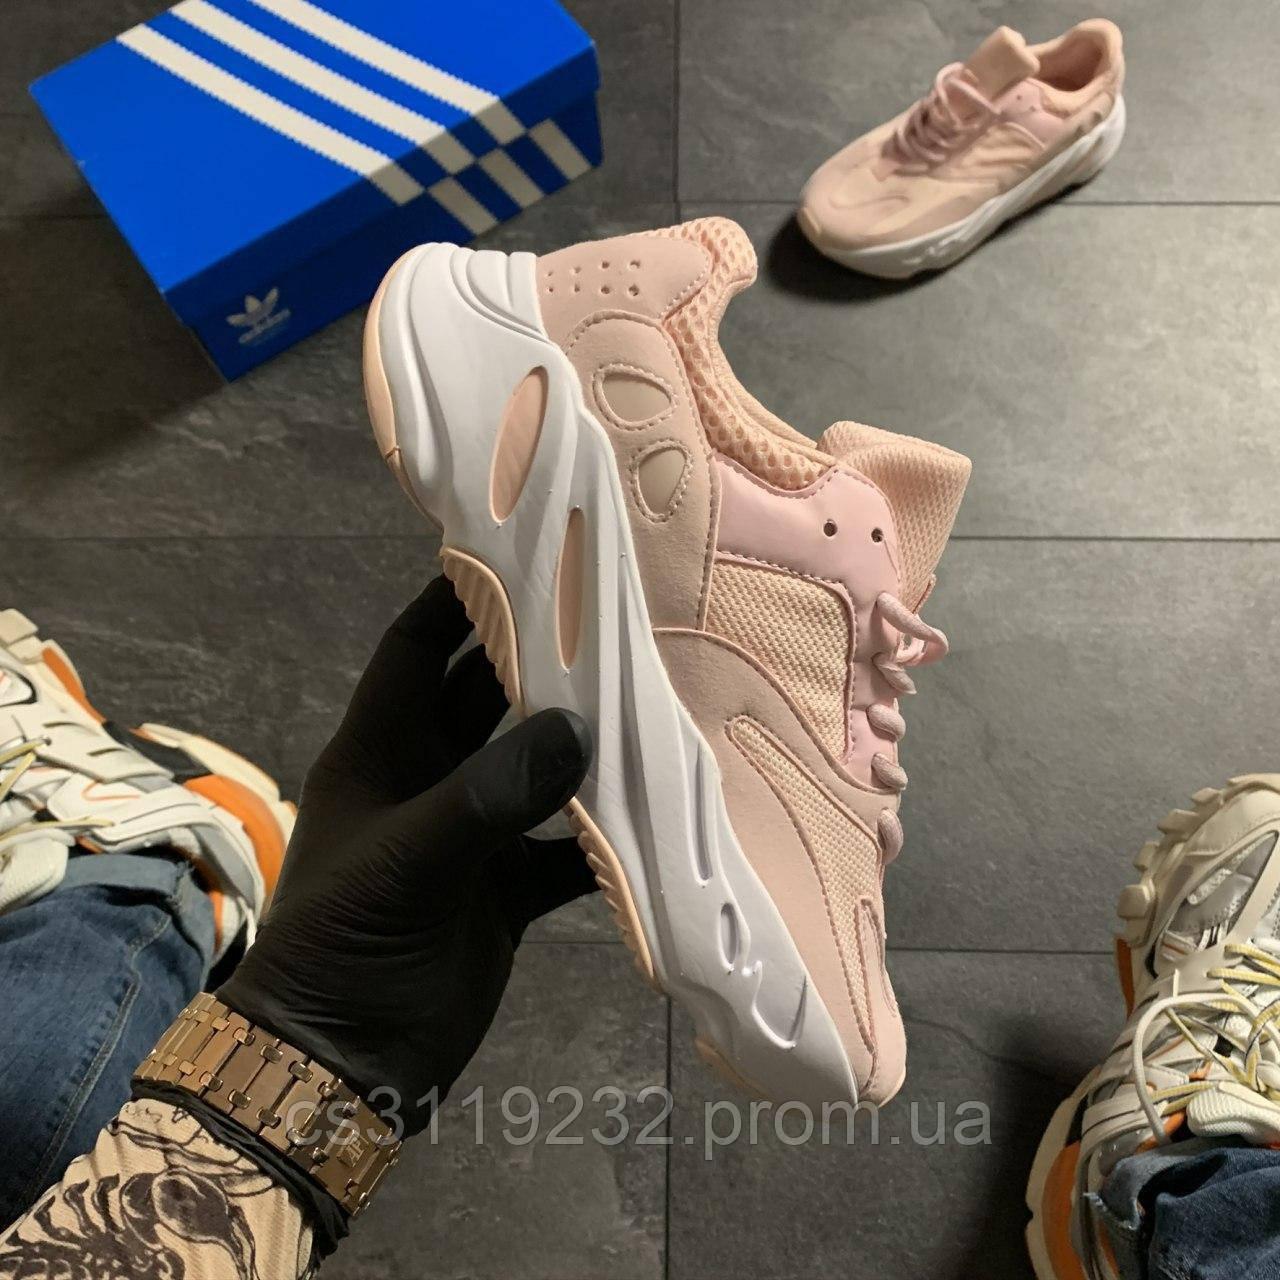 Женские кроссовки Adidas Yeezy Boost 700 Pink White (розовые)